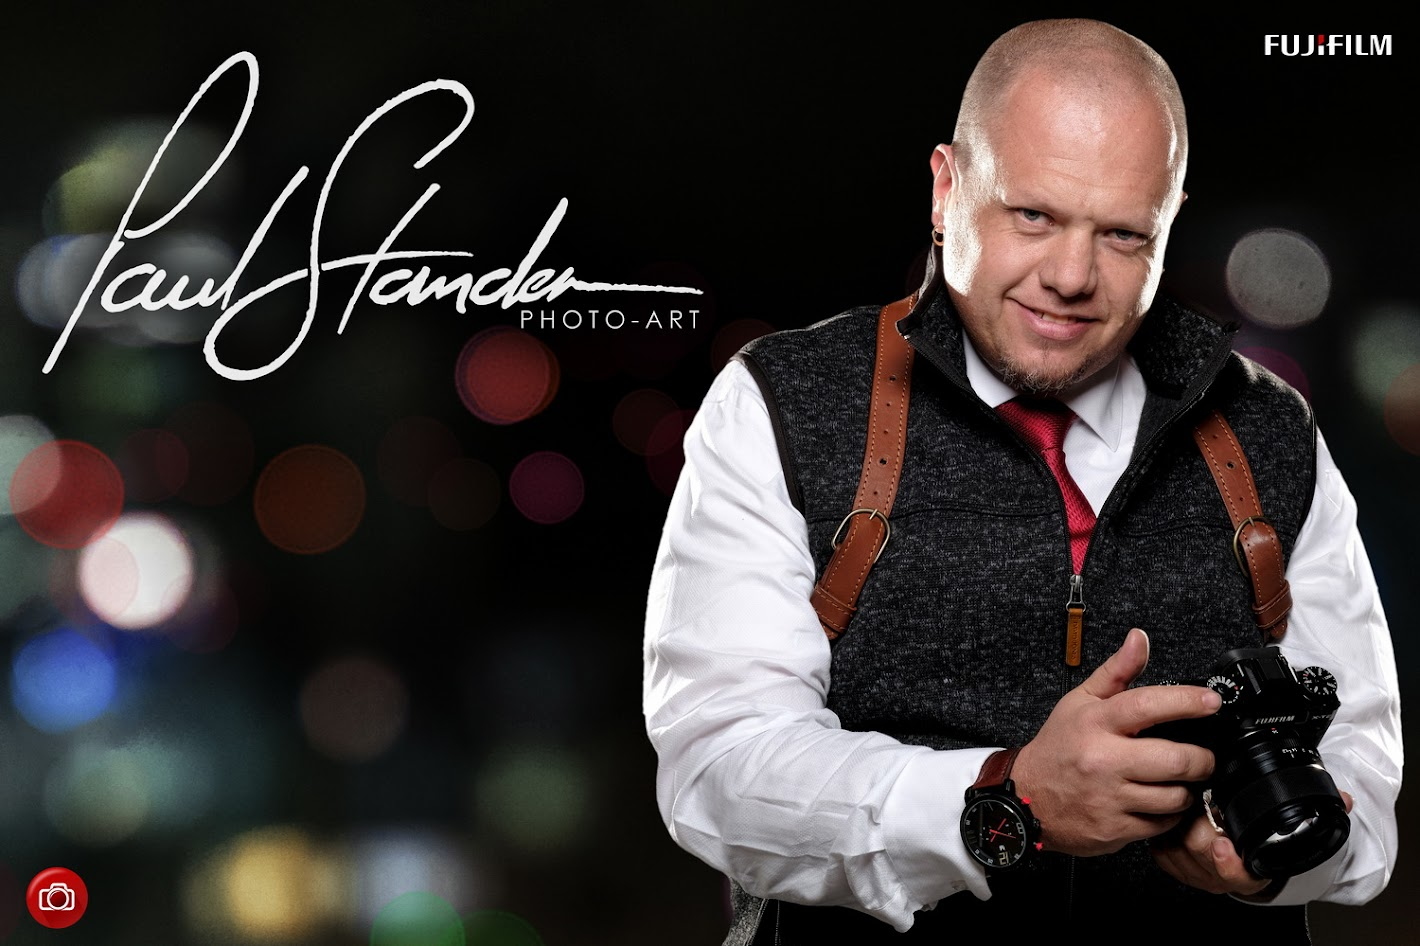 Paul Stander Photo-Art